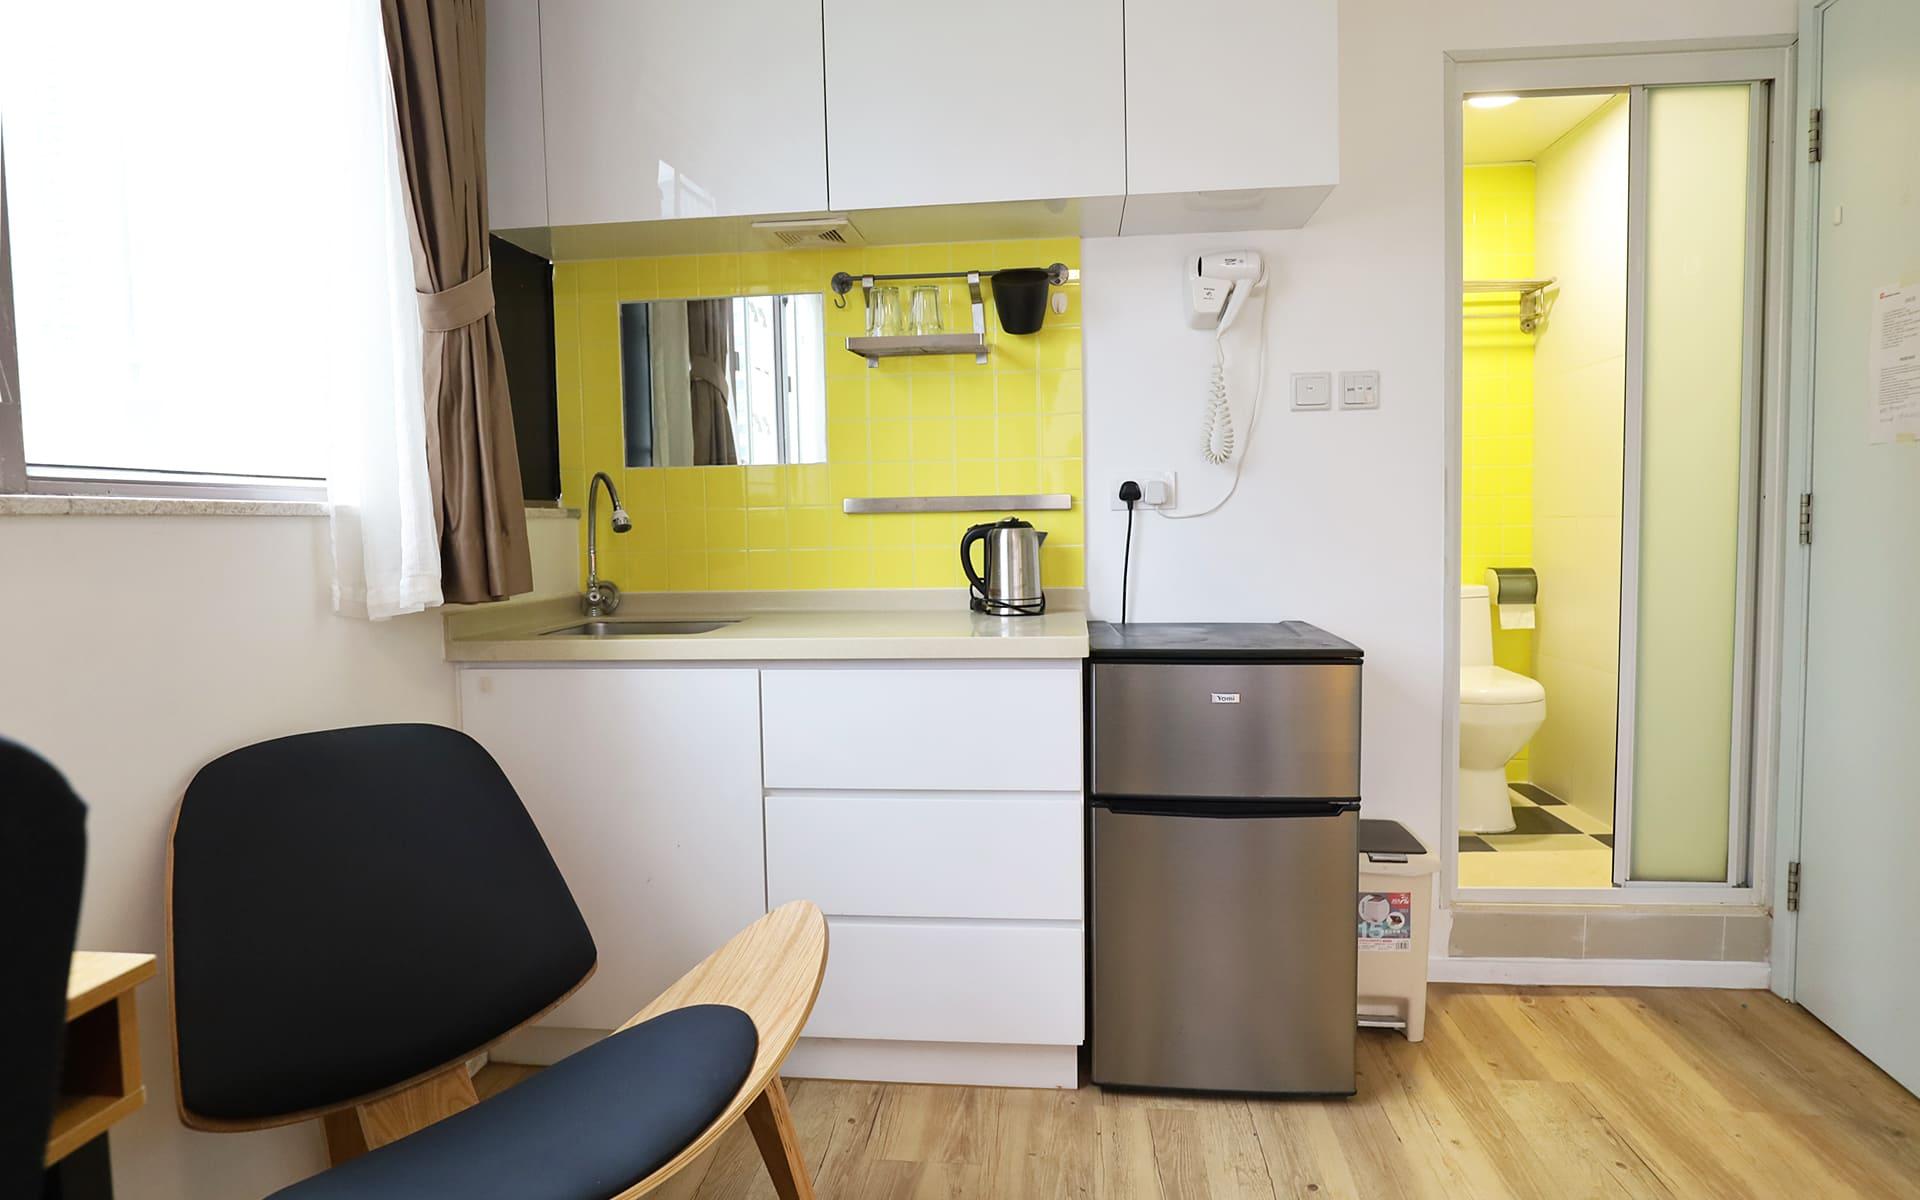 hk_service_apartment_17543212451589362127.jpg